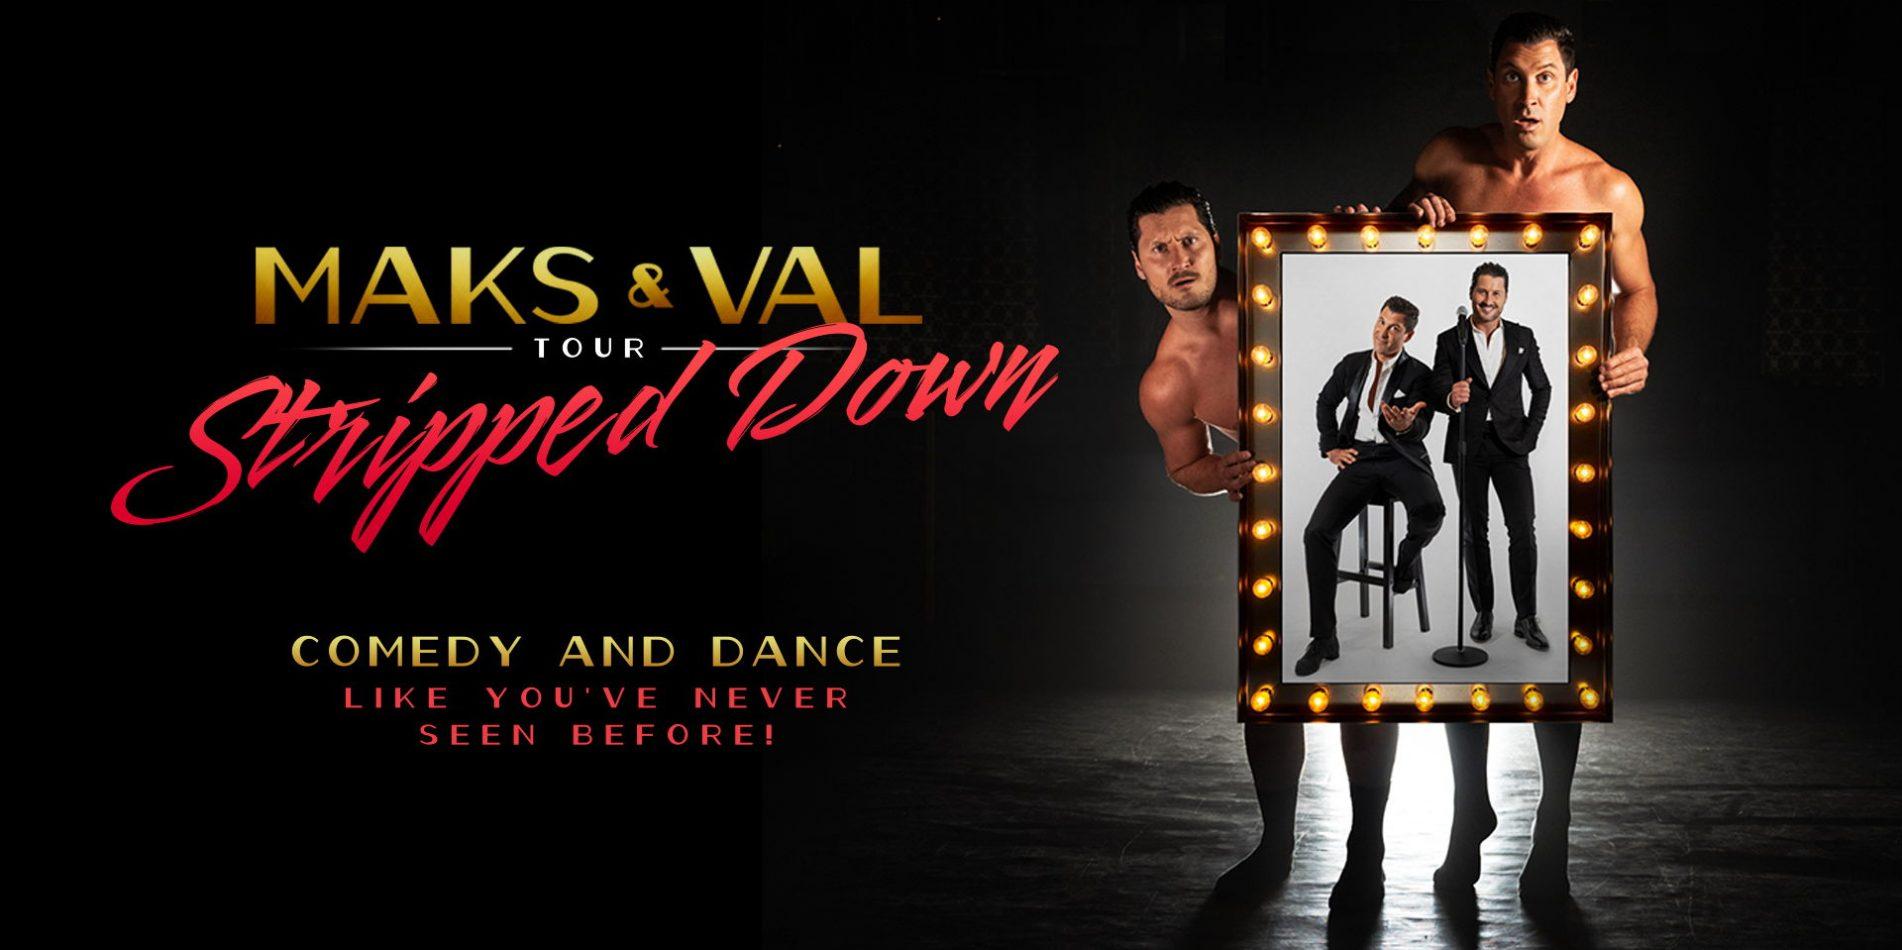 Maks & Val: Stripped Down